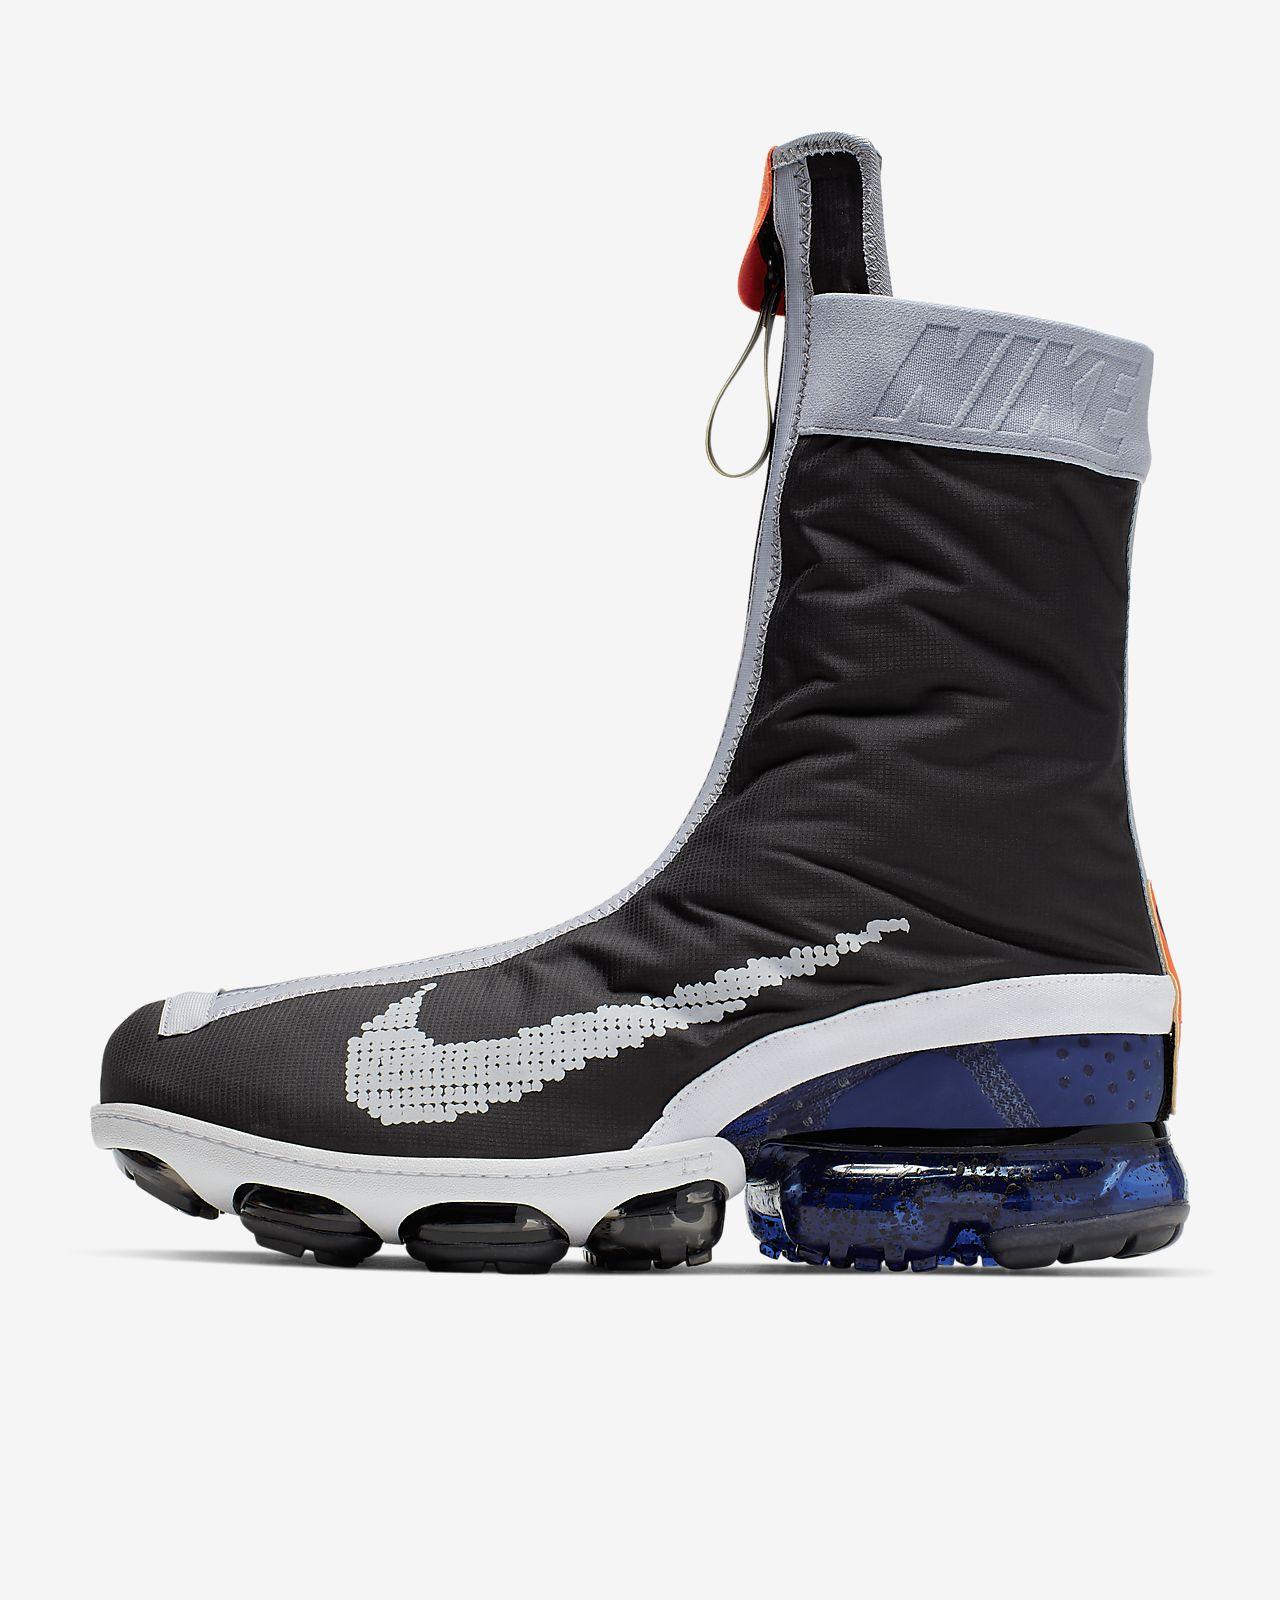 Nike Air VaporMax FlyKnit Gaiter ISPA cipő